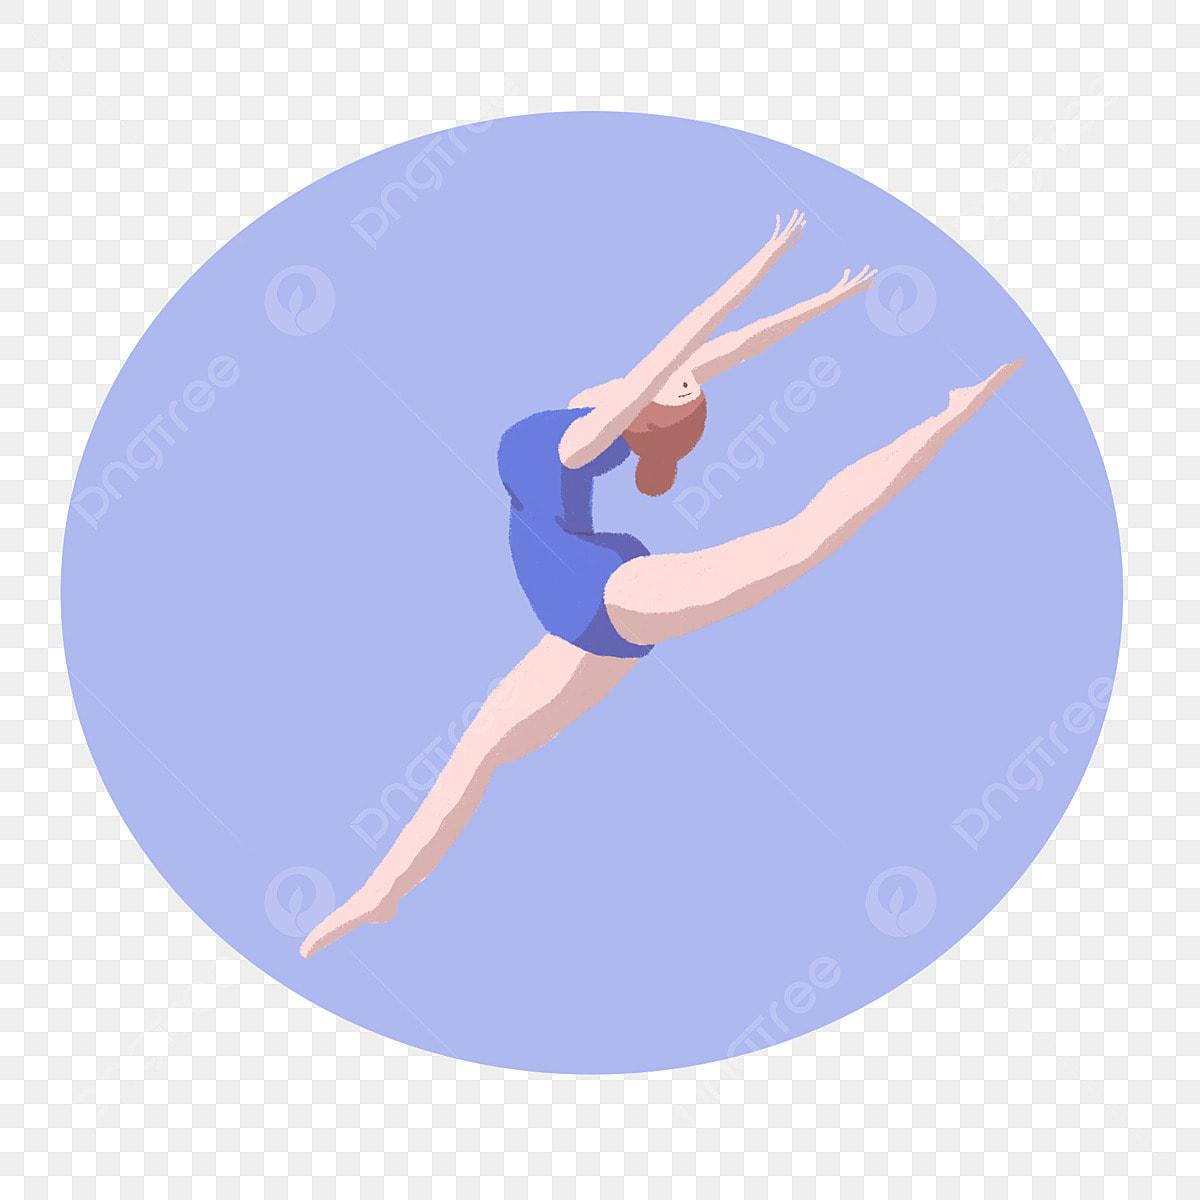 Free Cute Gymnastics Cliparts, Download Free Clip Art, Free Clip Art on  Clipart Library